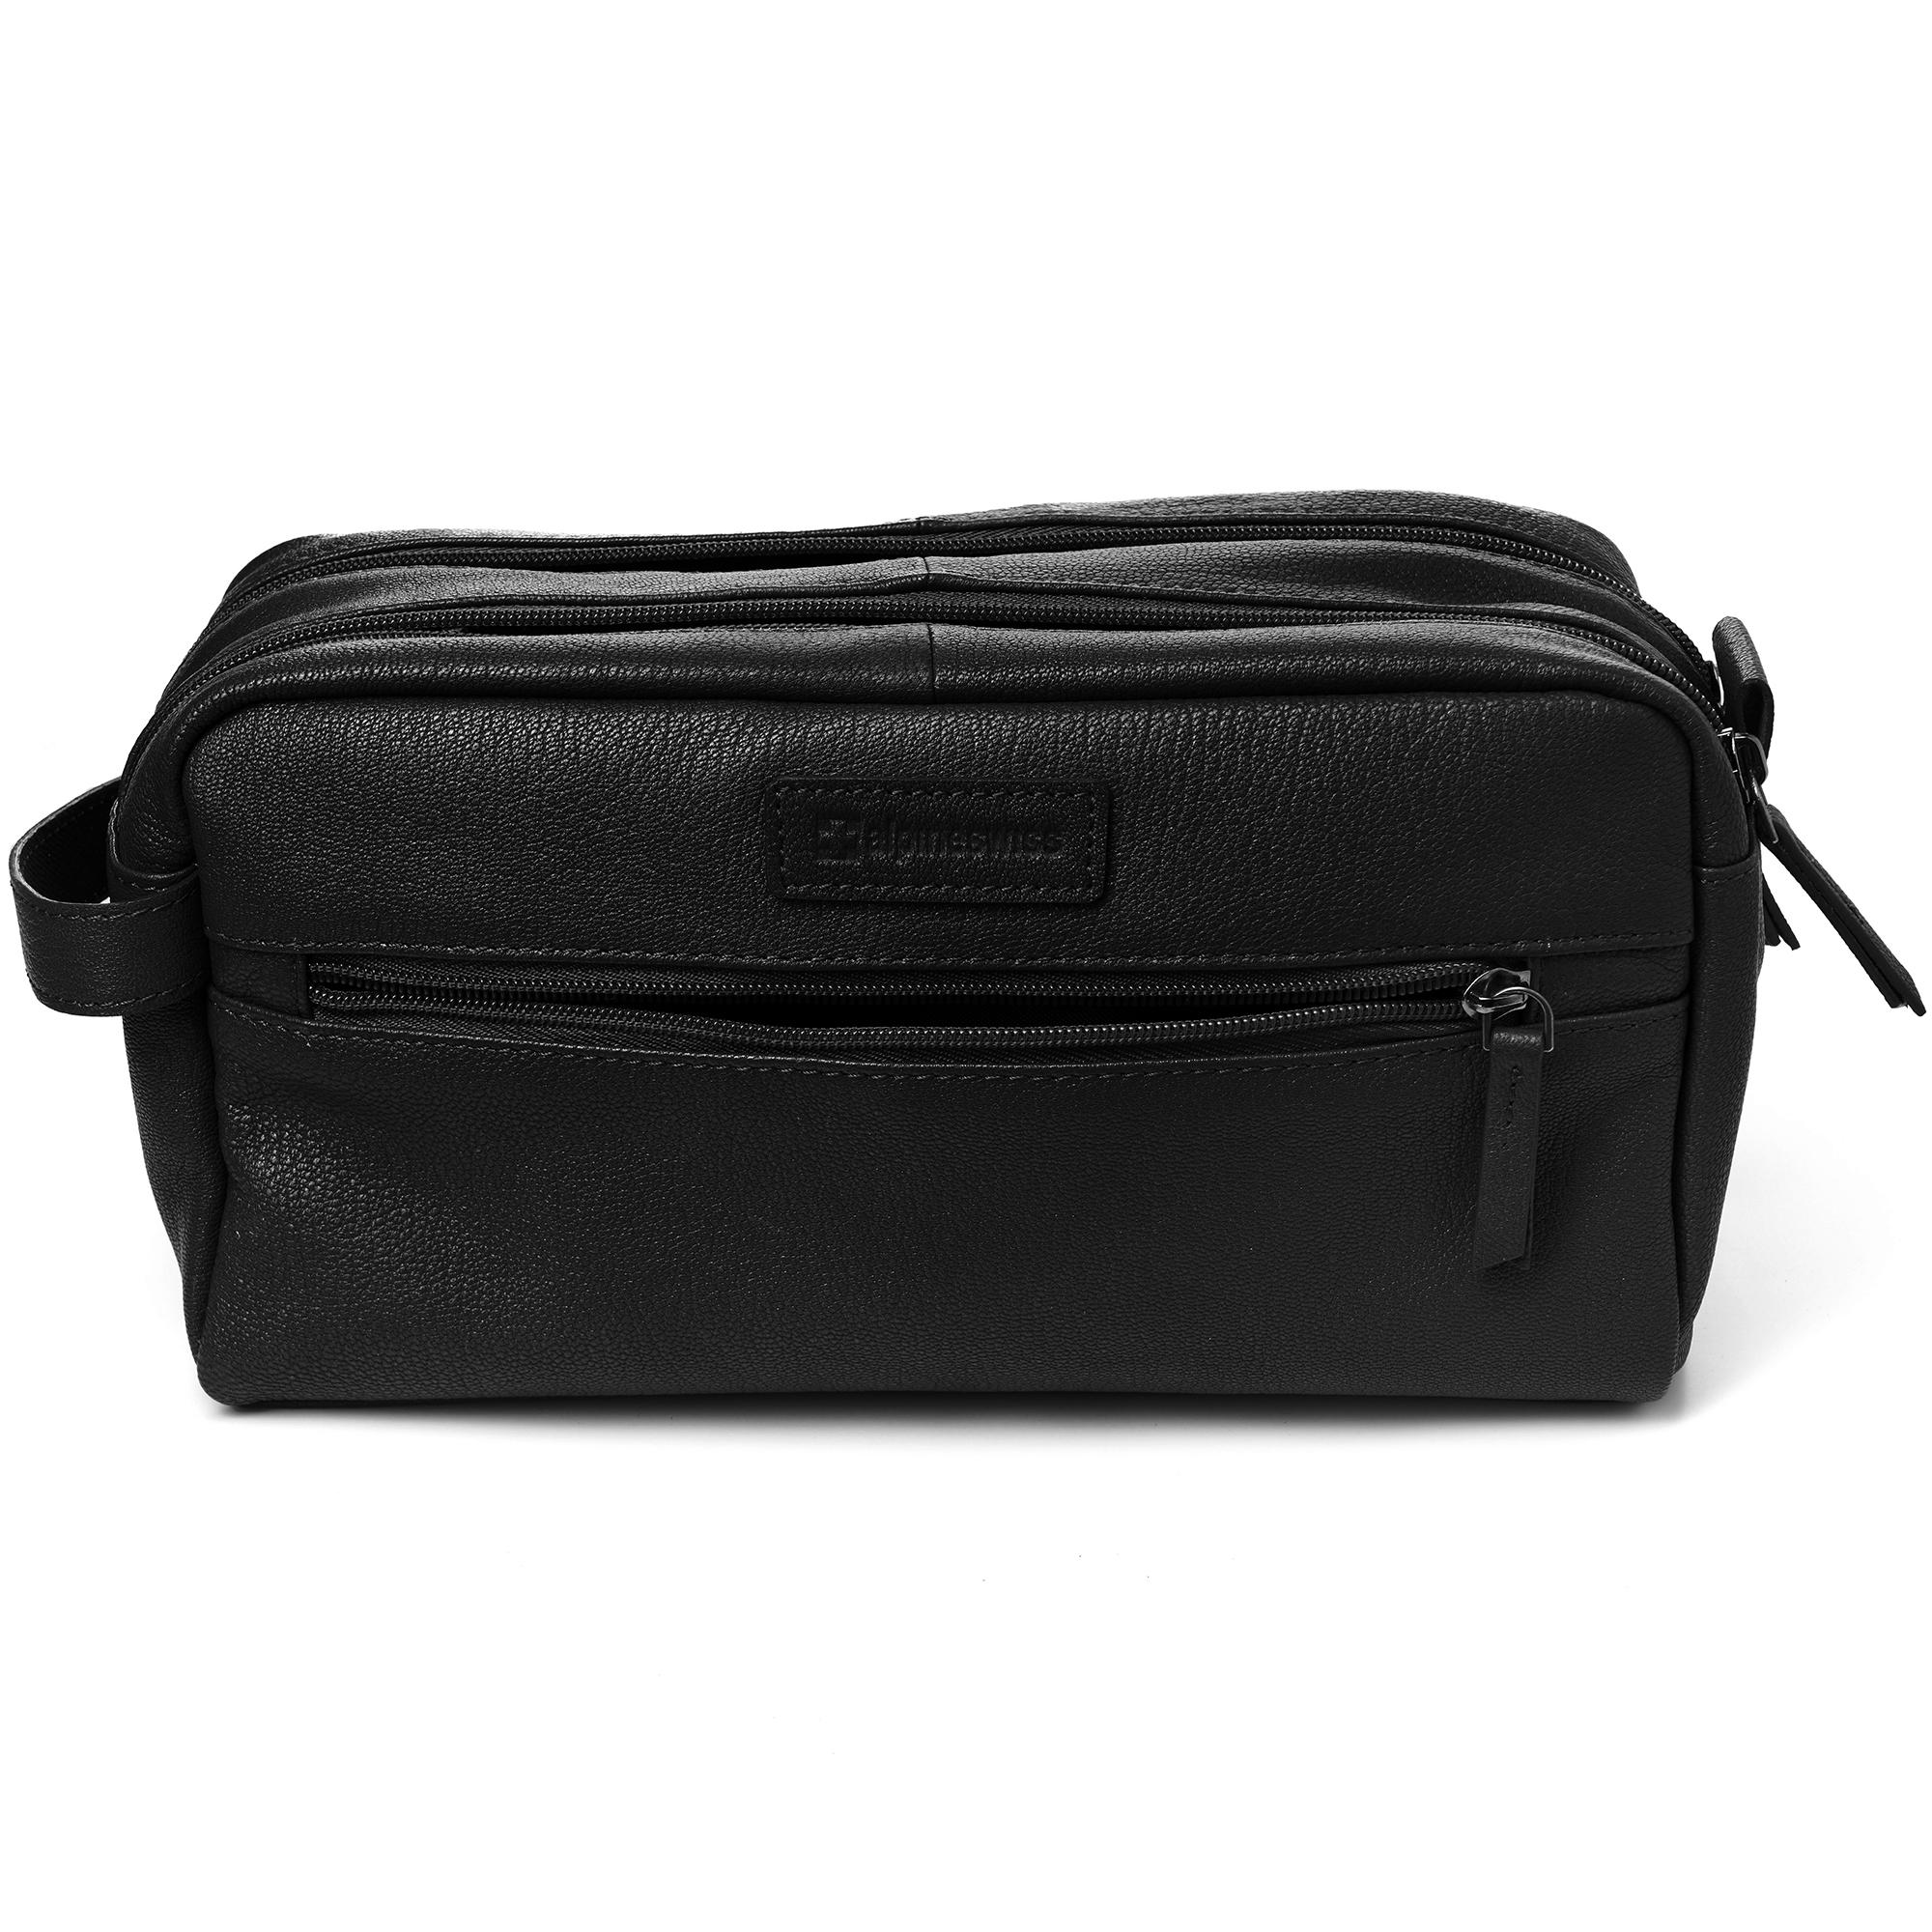 AlpineSwiss-Sedona-Toiletry-Bag-Genuine-Leather-Shaving-Kit-Dopp-Kit-Travel-Case thumbnail 16